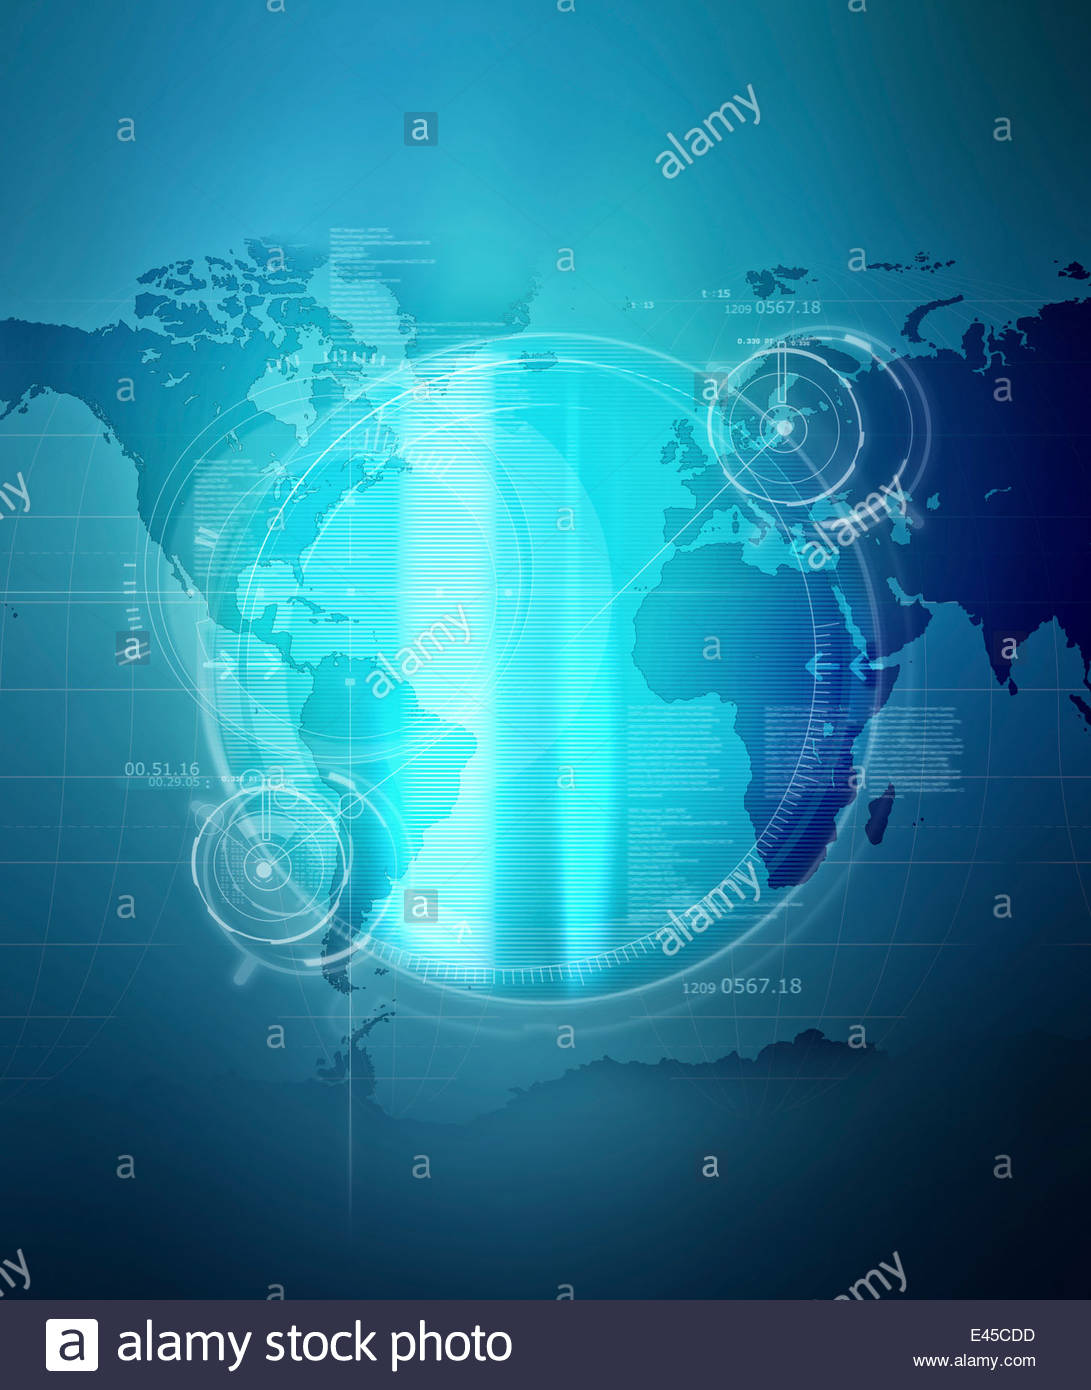 Illuminated targets and data over blue world map - Stock Image